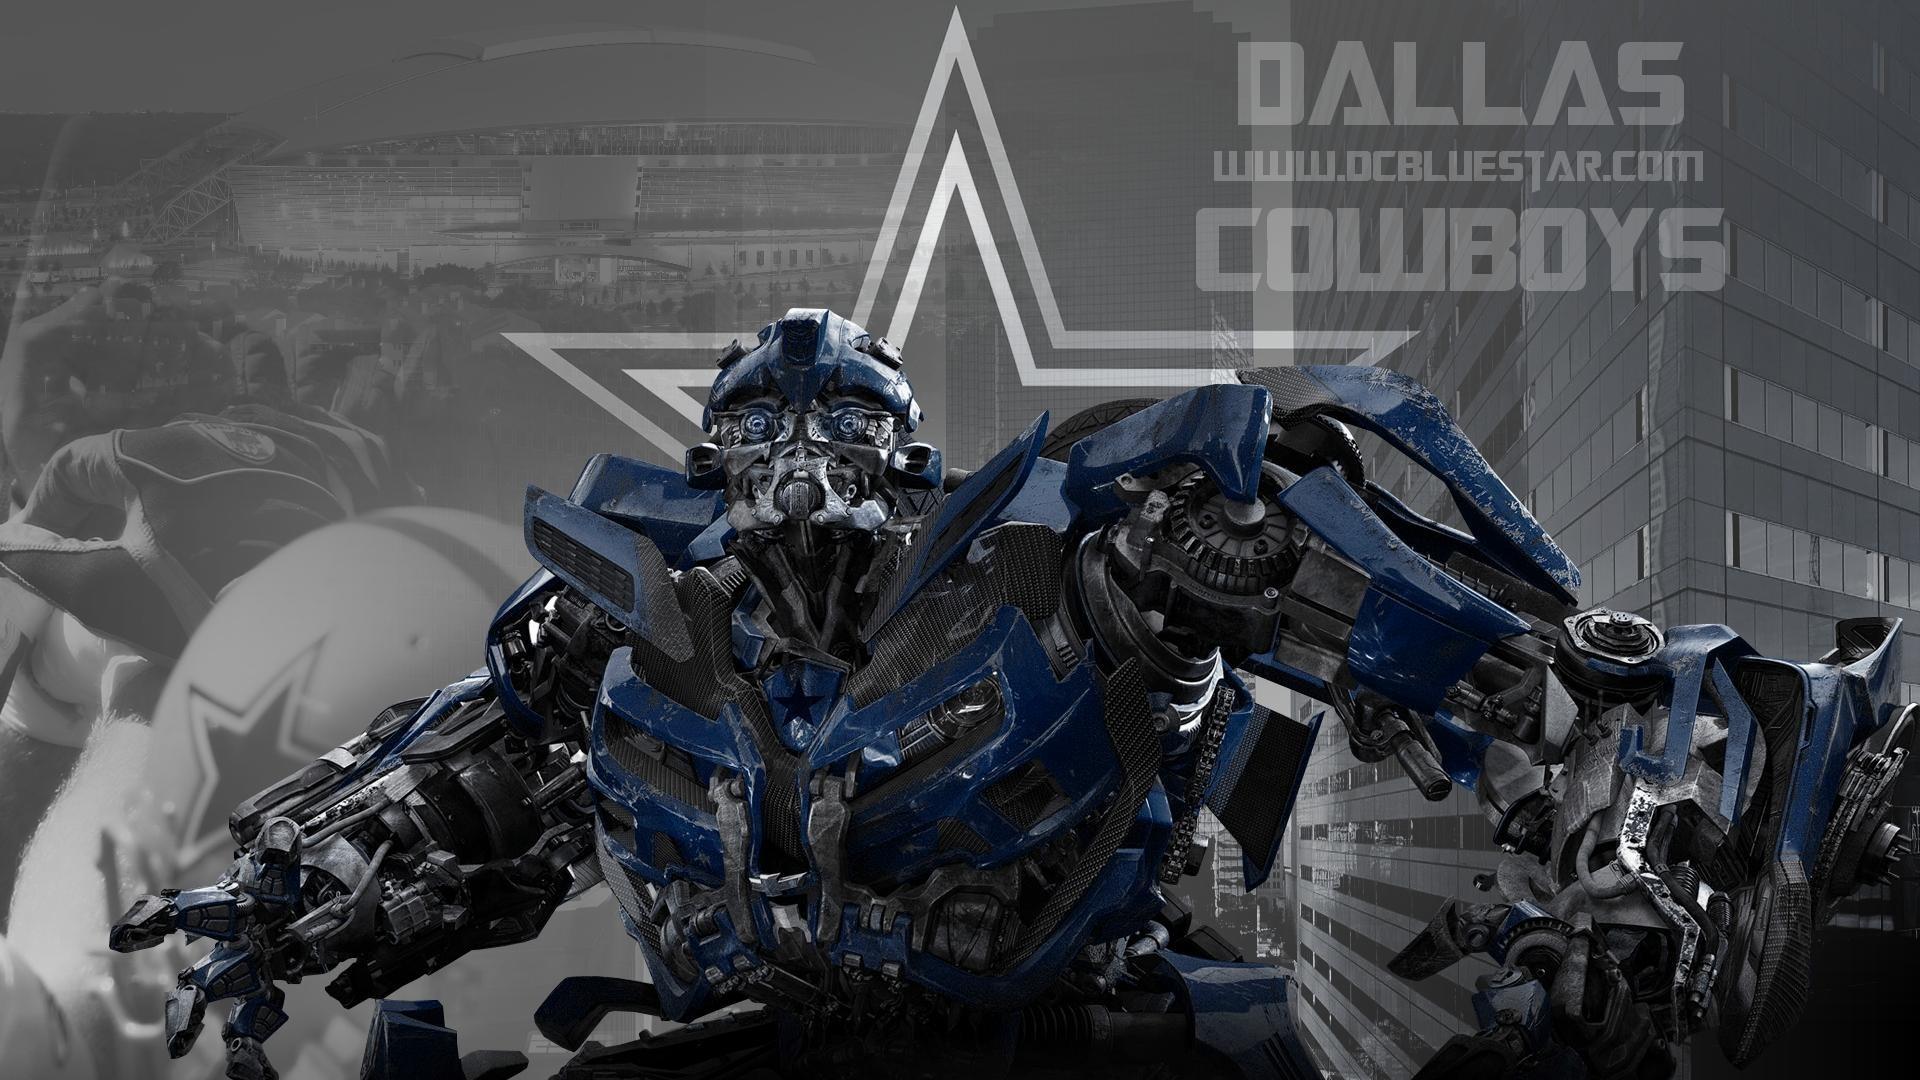 Dallas Cowboys Wallpapers Hd 66 Images